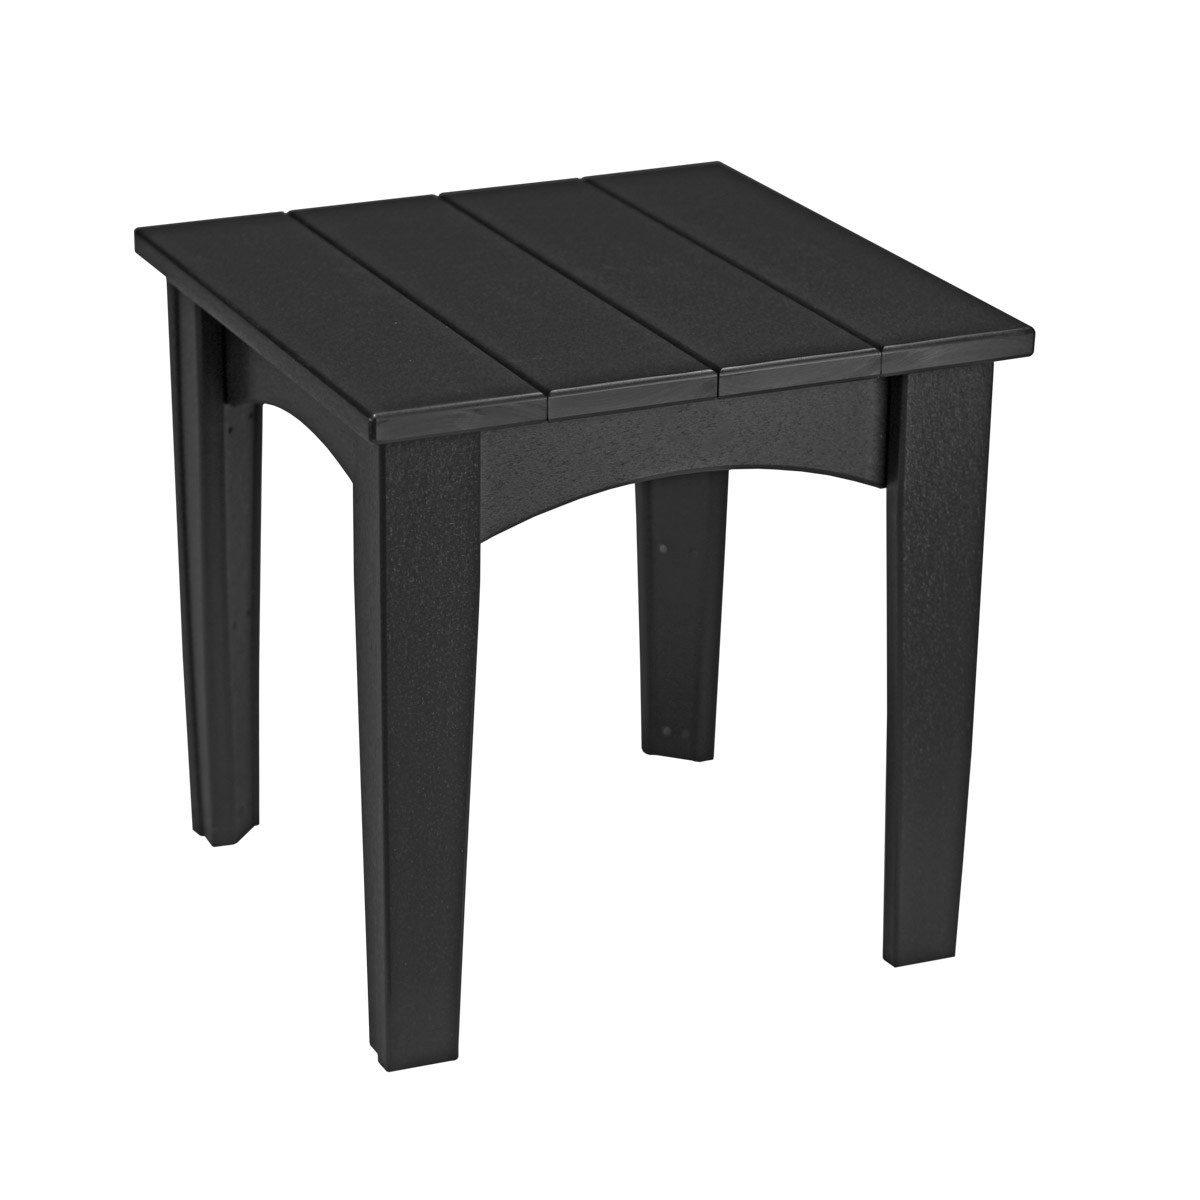 Island End Table - Black